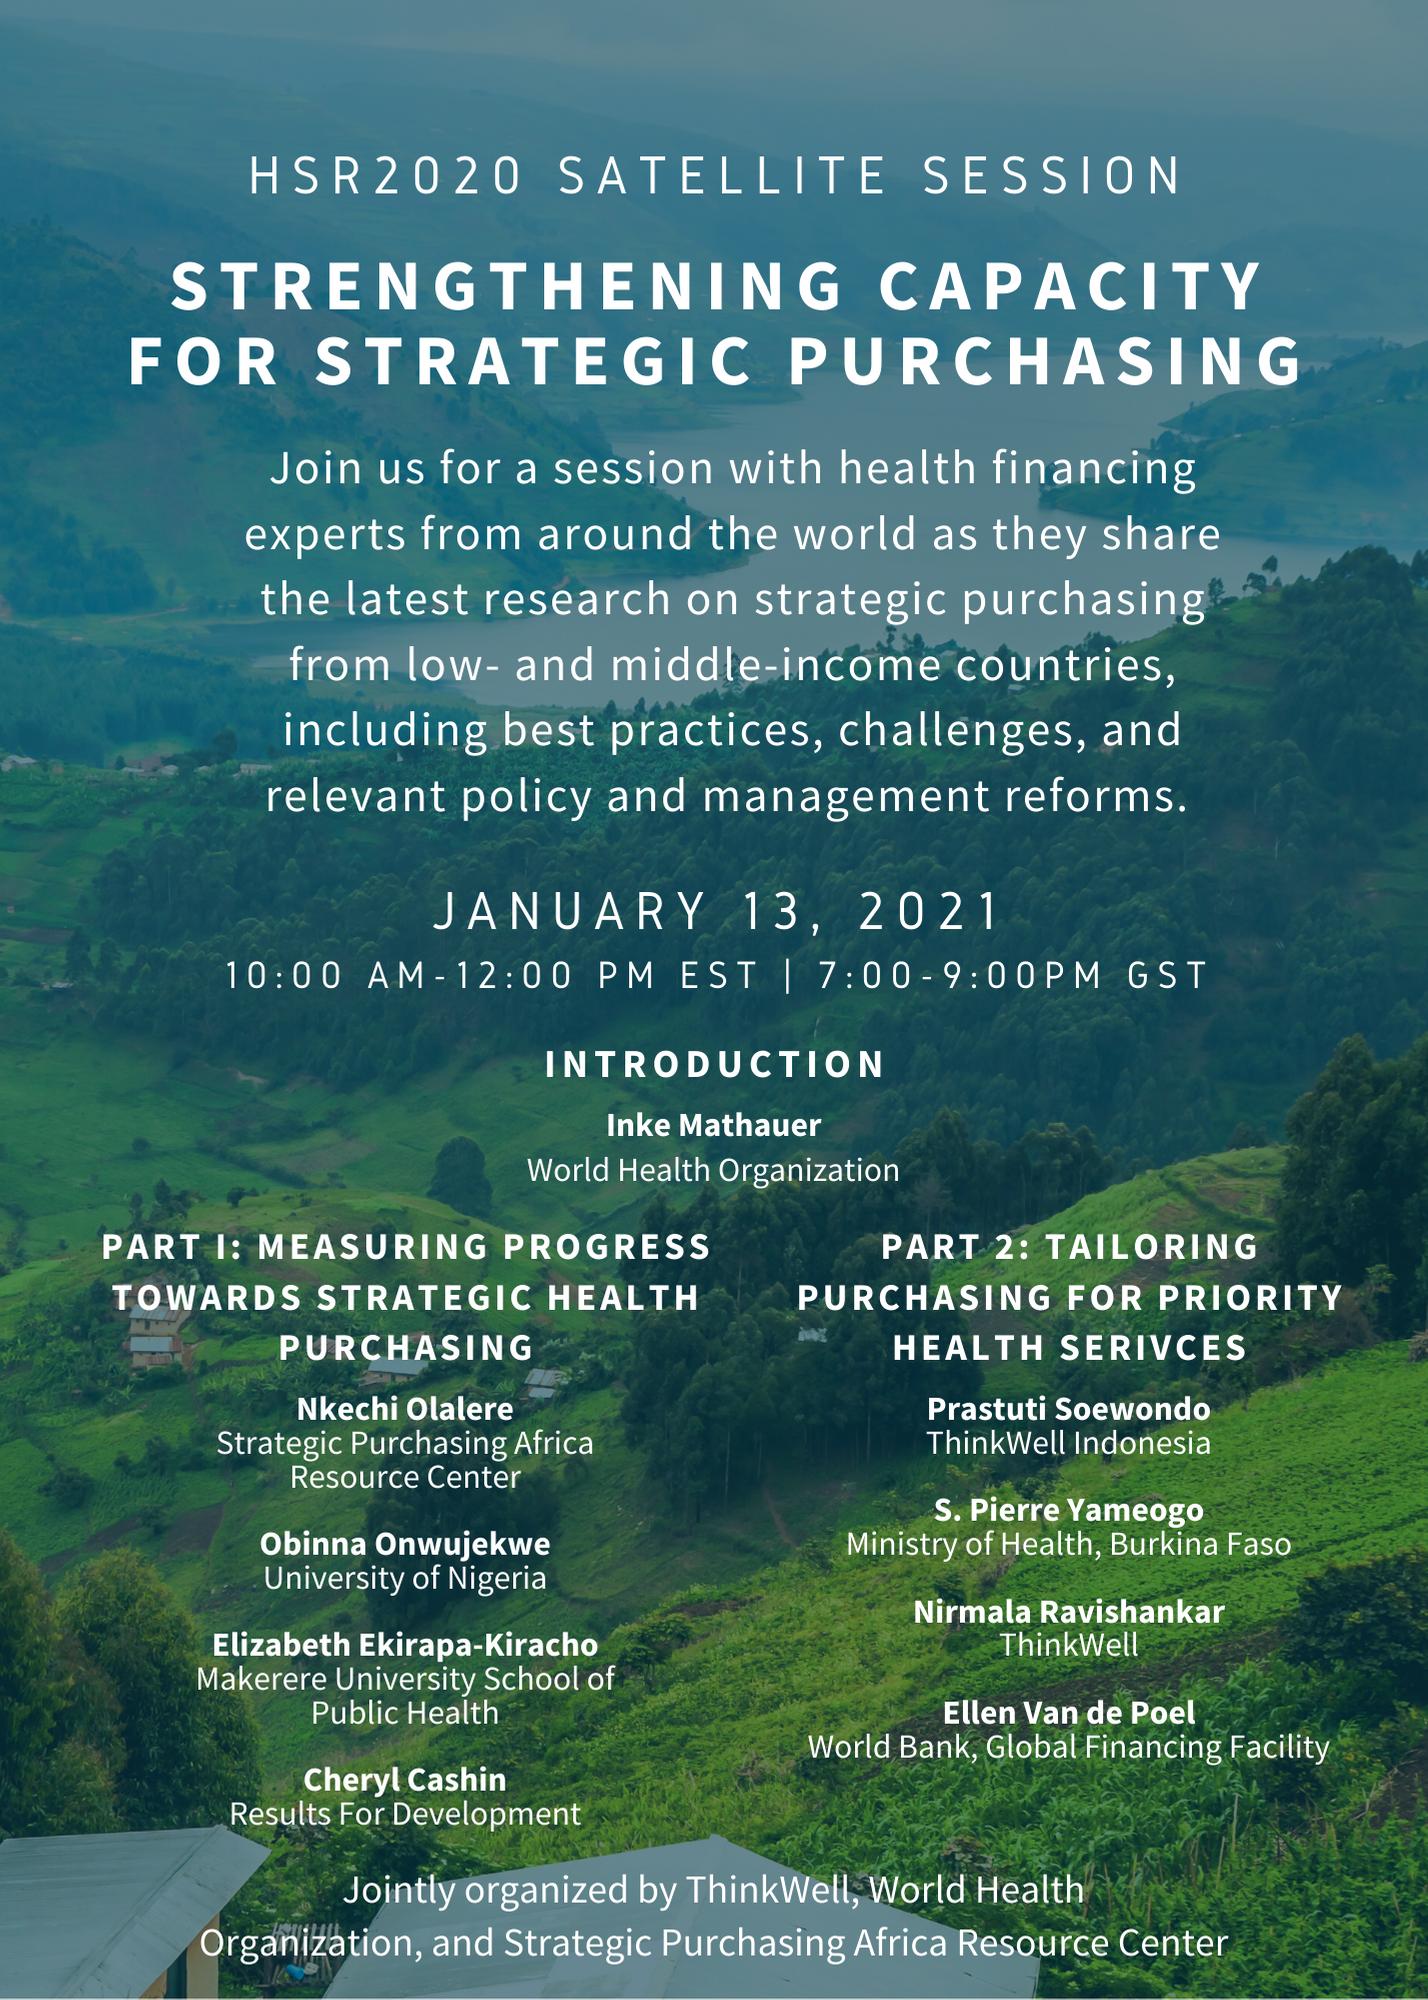 Strengthening Capacity for Strategic Purchasing: HSR2020 SPARC Satellite Session Q&A